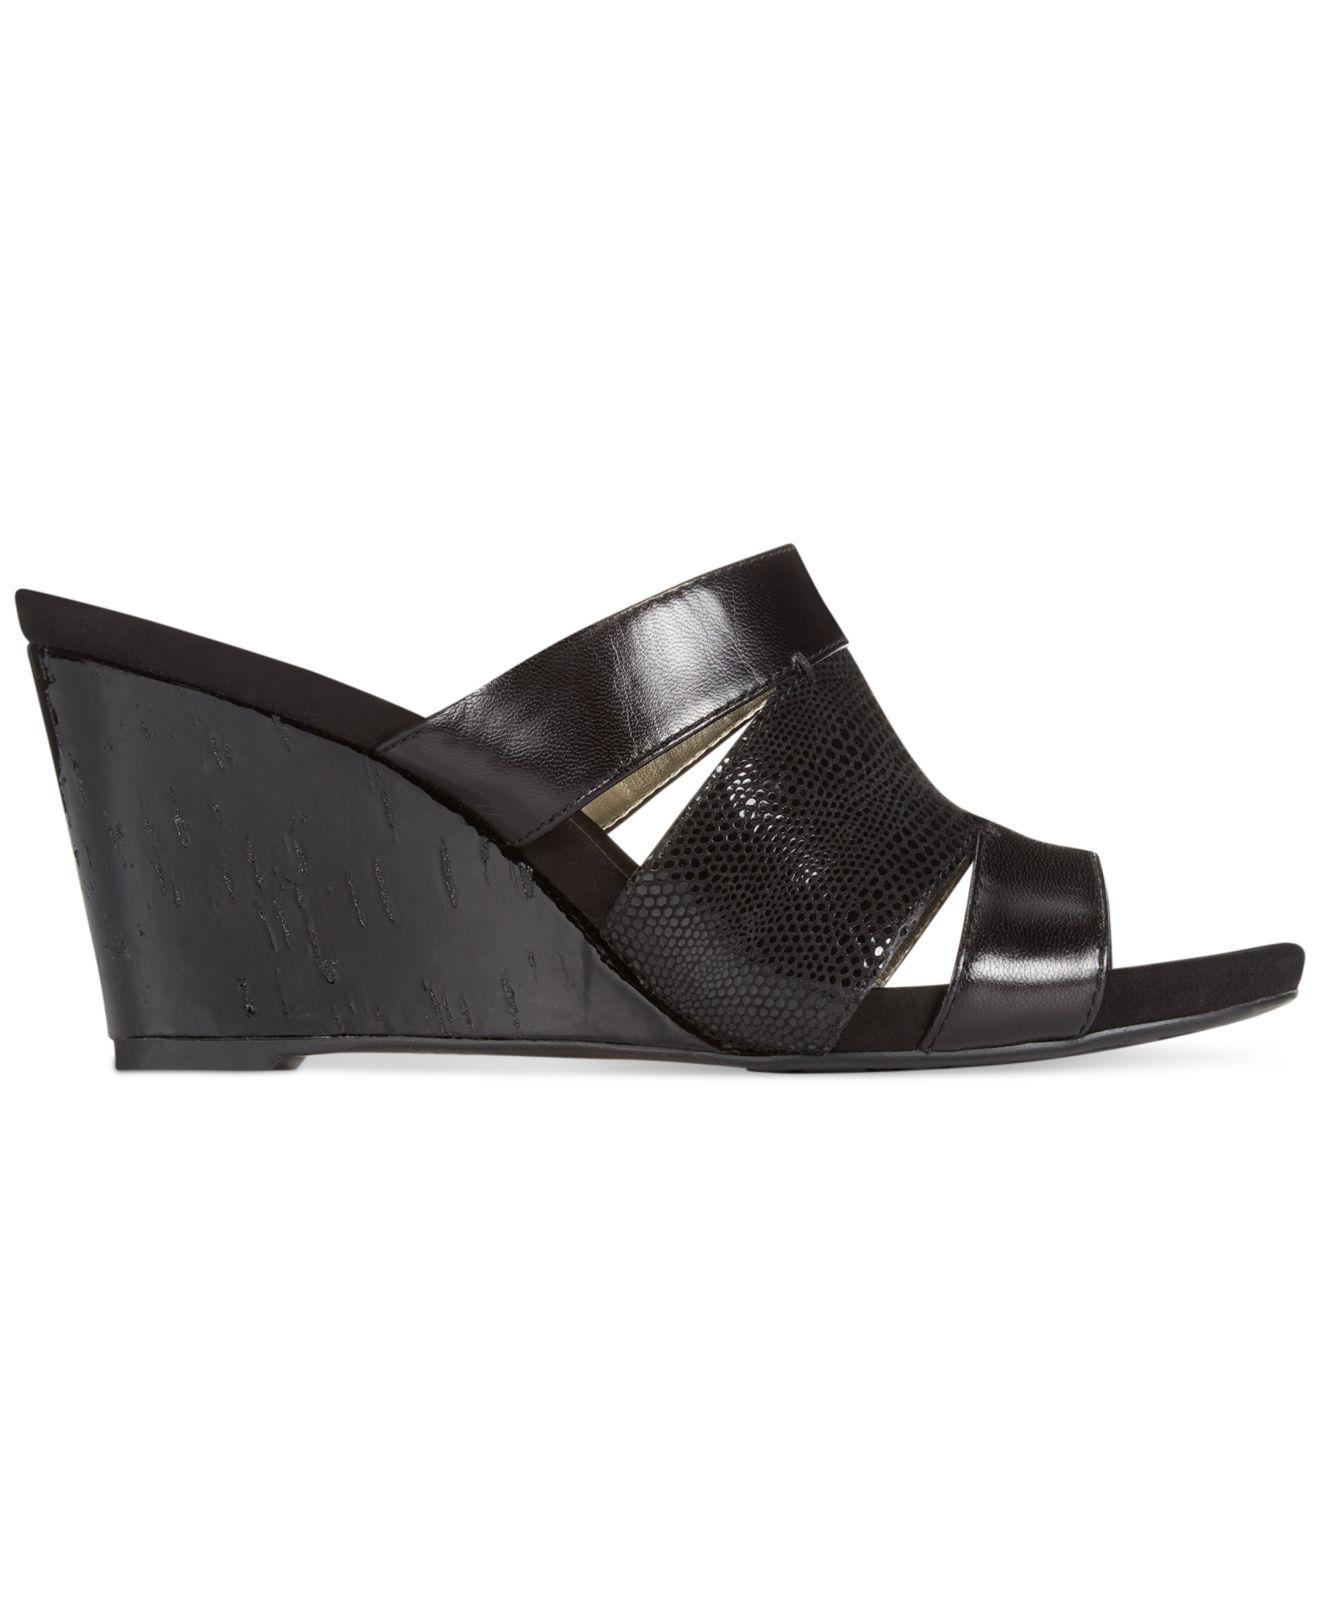 422104834e2 Lyst - Anne Klein Loopy Wedge Sandals in Black